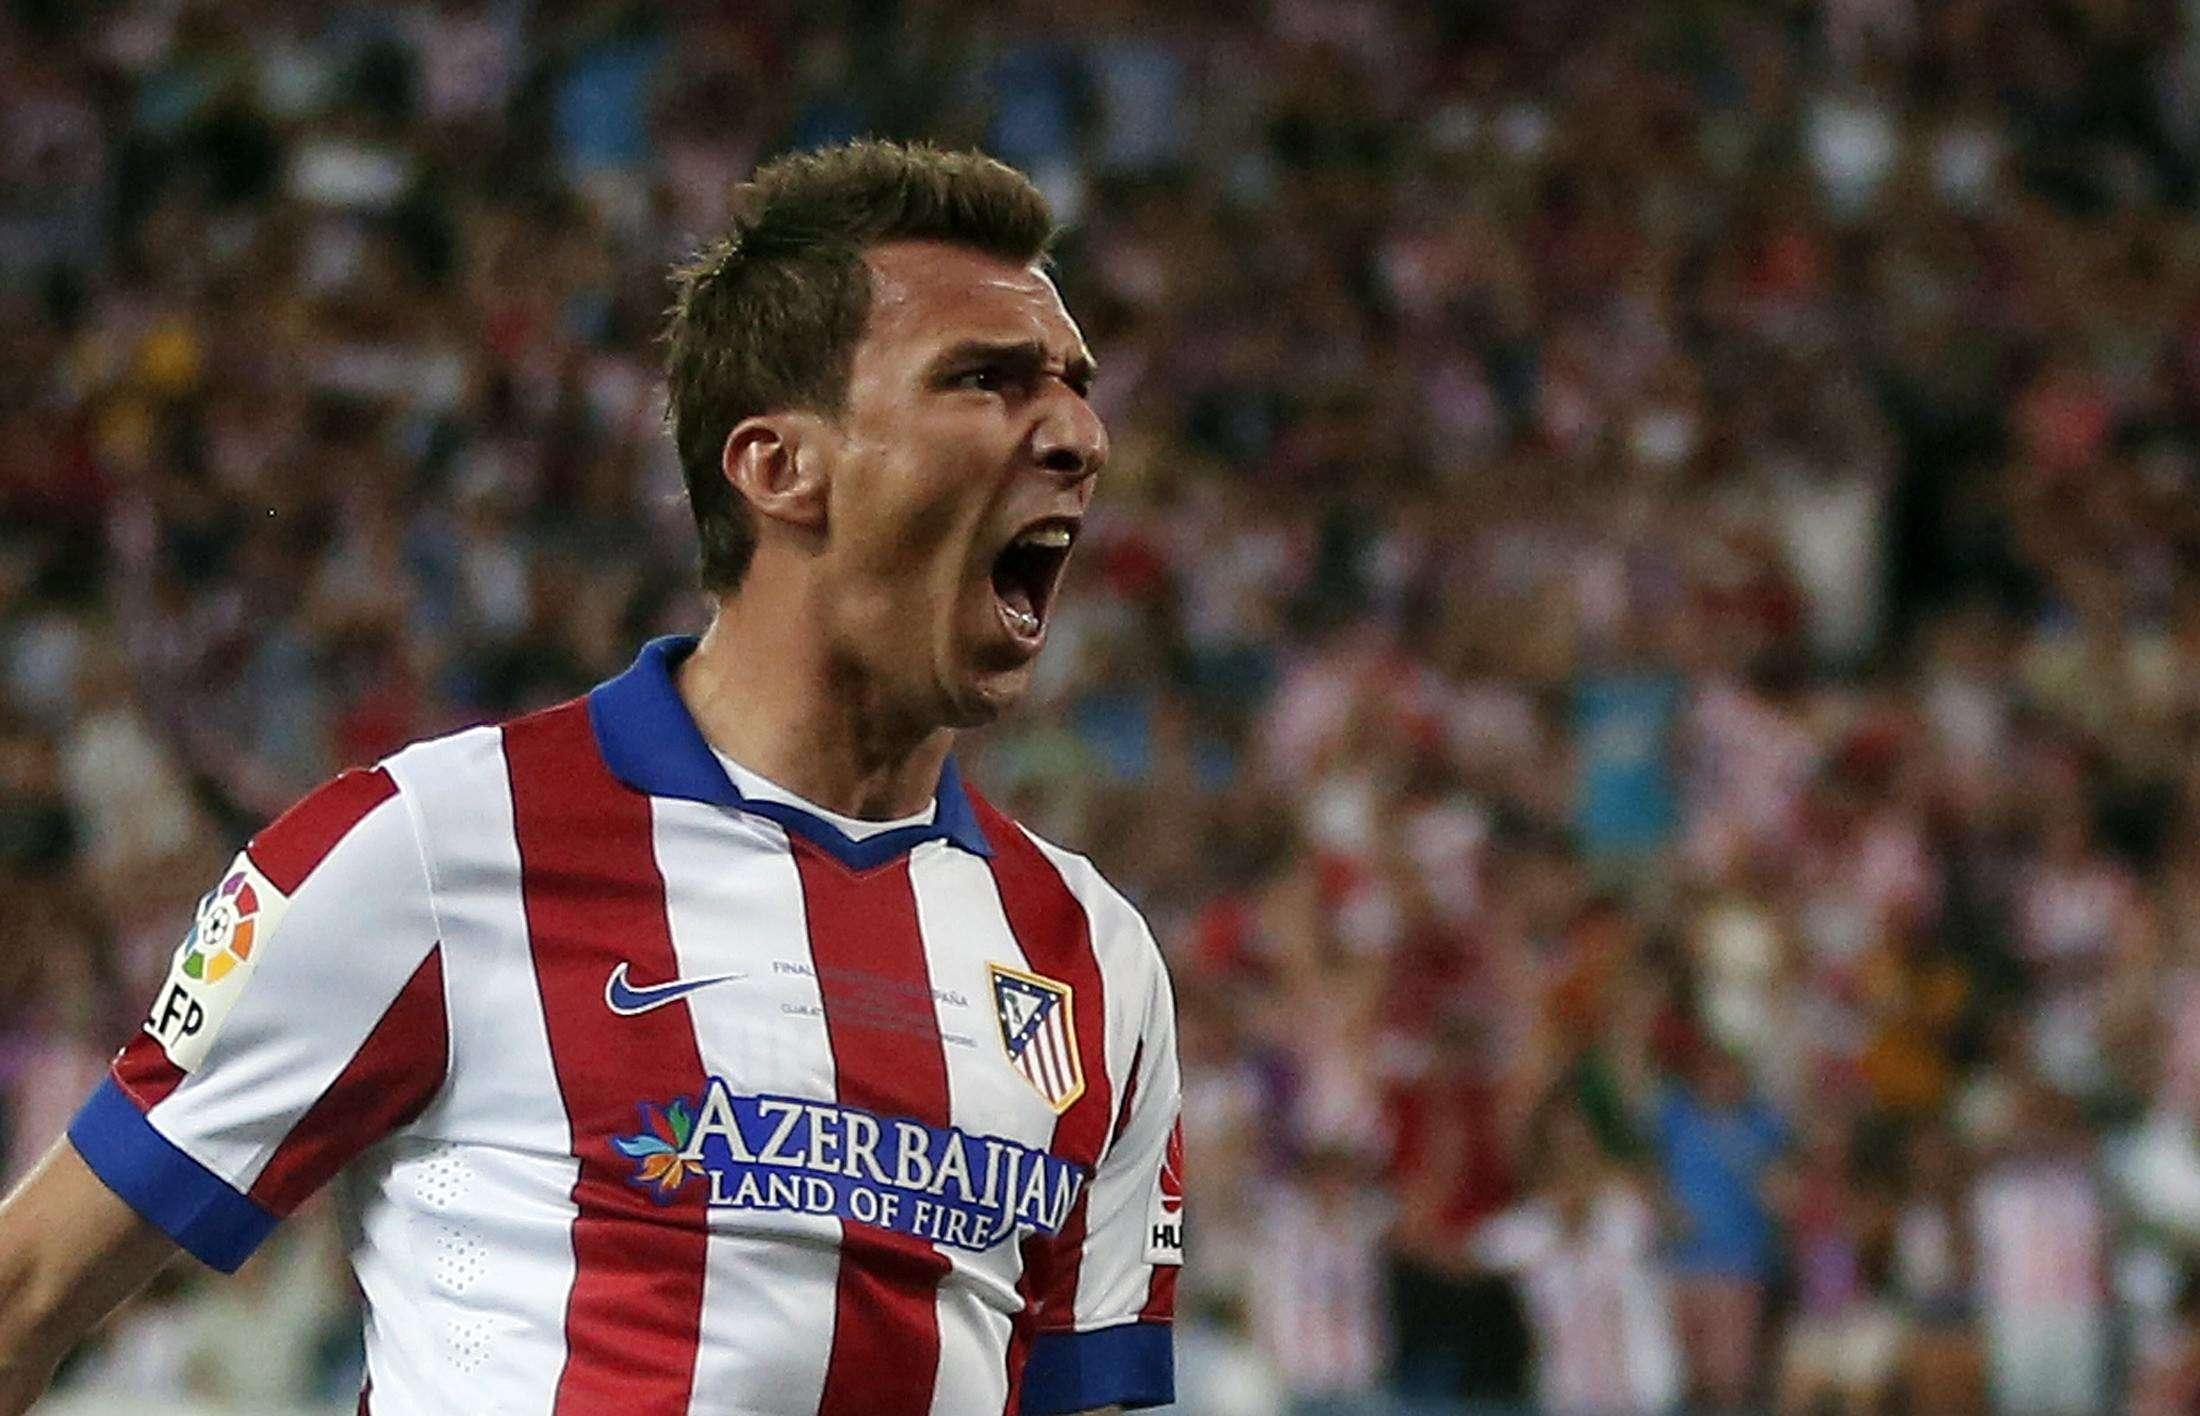 Mandzukic comemora o gol do título do Atlético de Madrid Foto: Juan Medina/Reuters